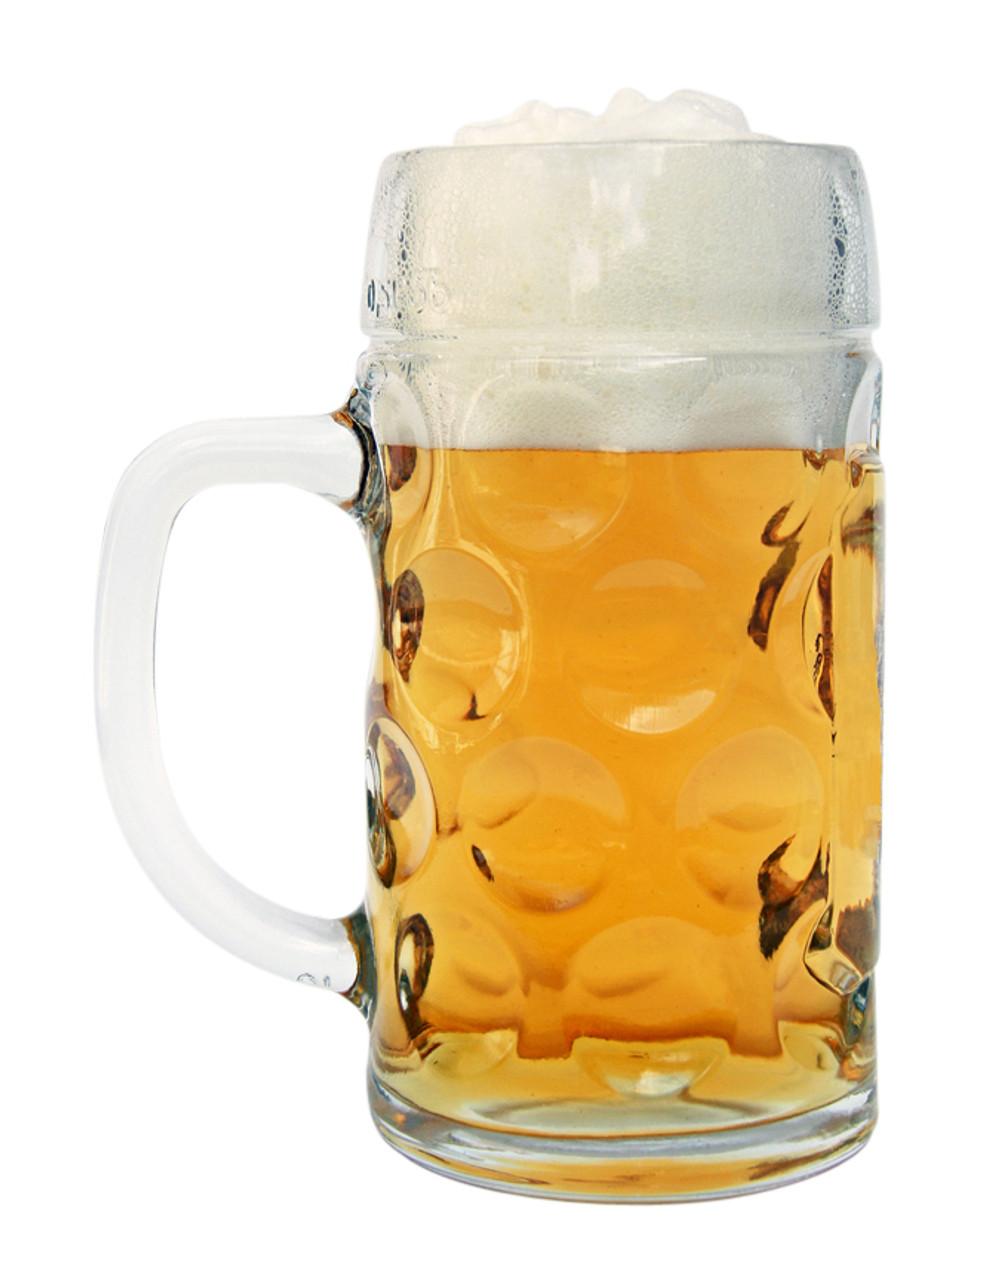 Undecorated Back of .5 L Glass Beer Mug